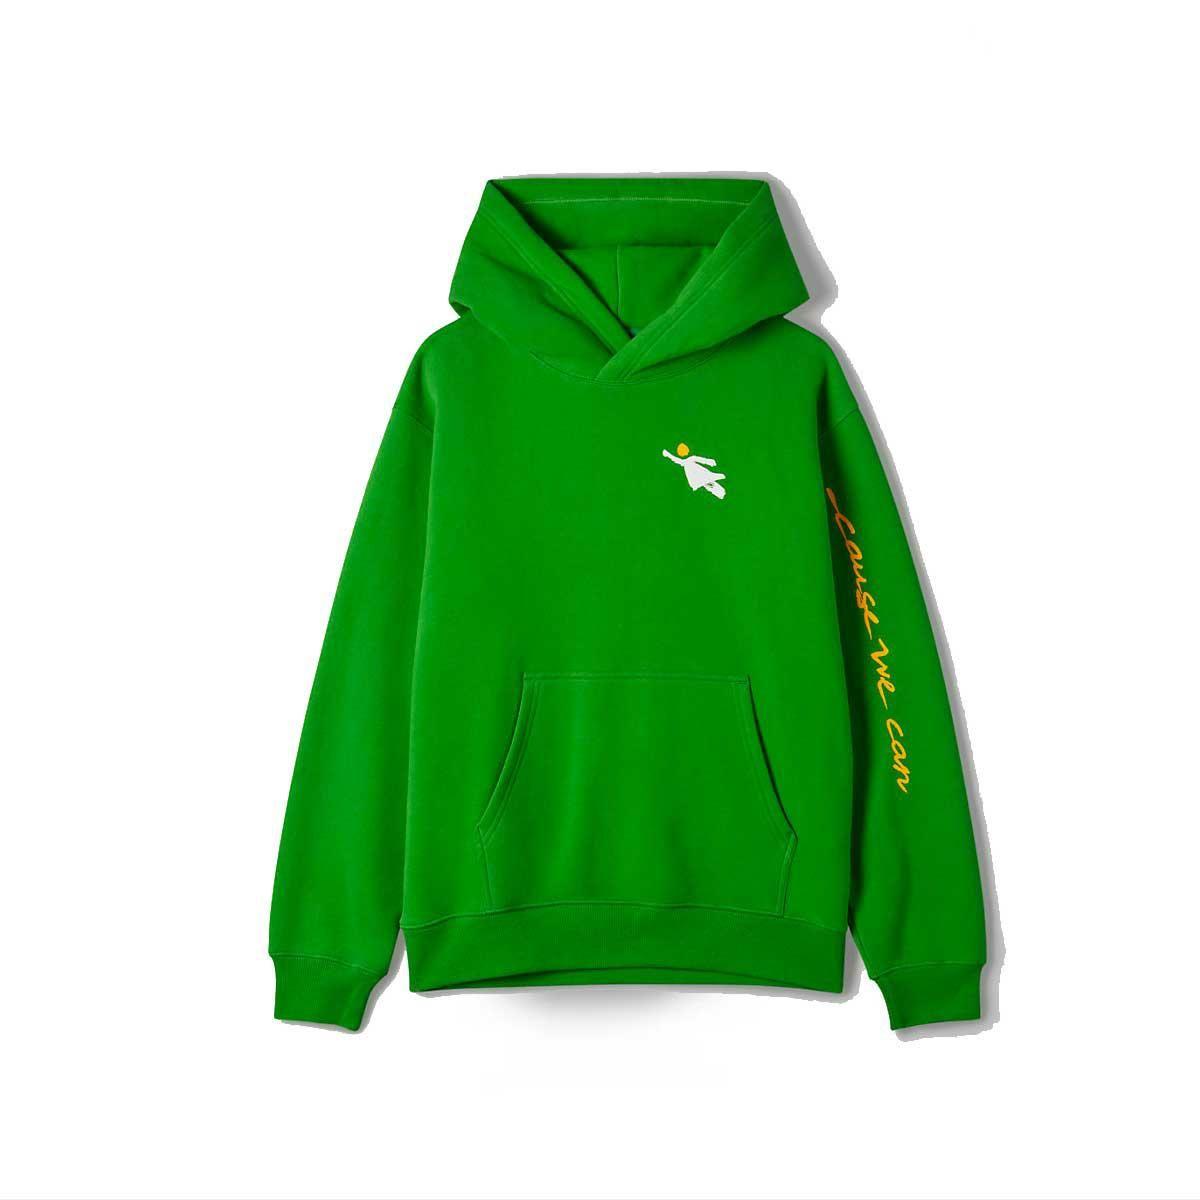 aritzia community cause we care hoodie